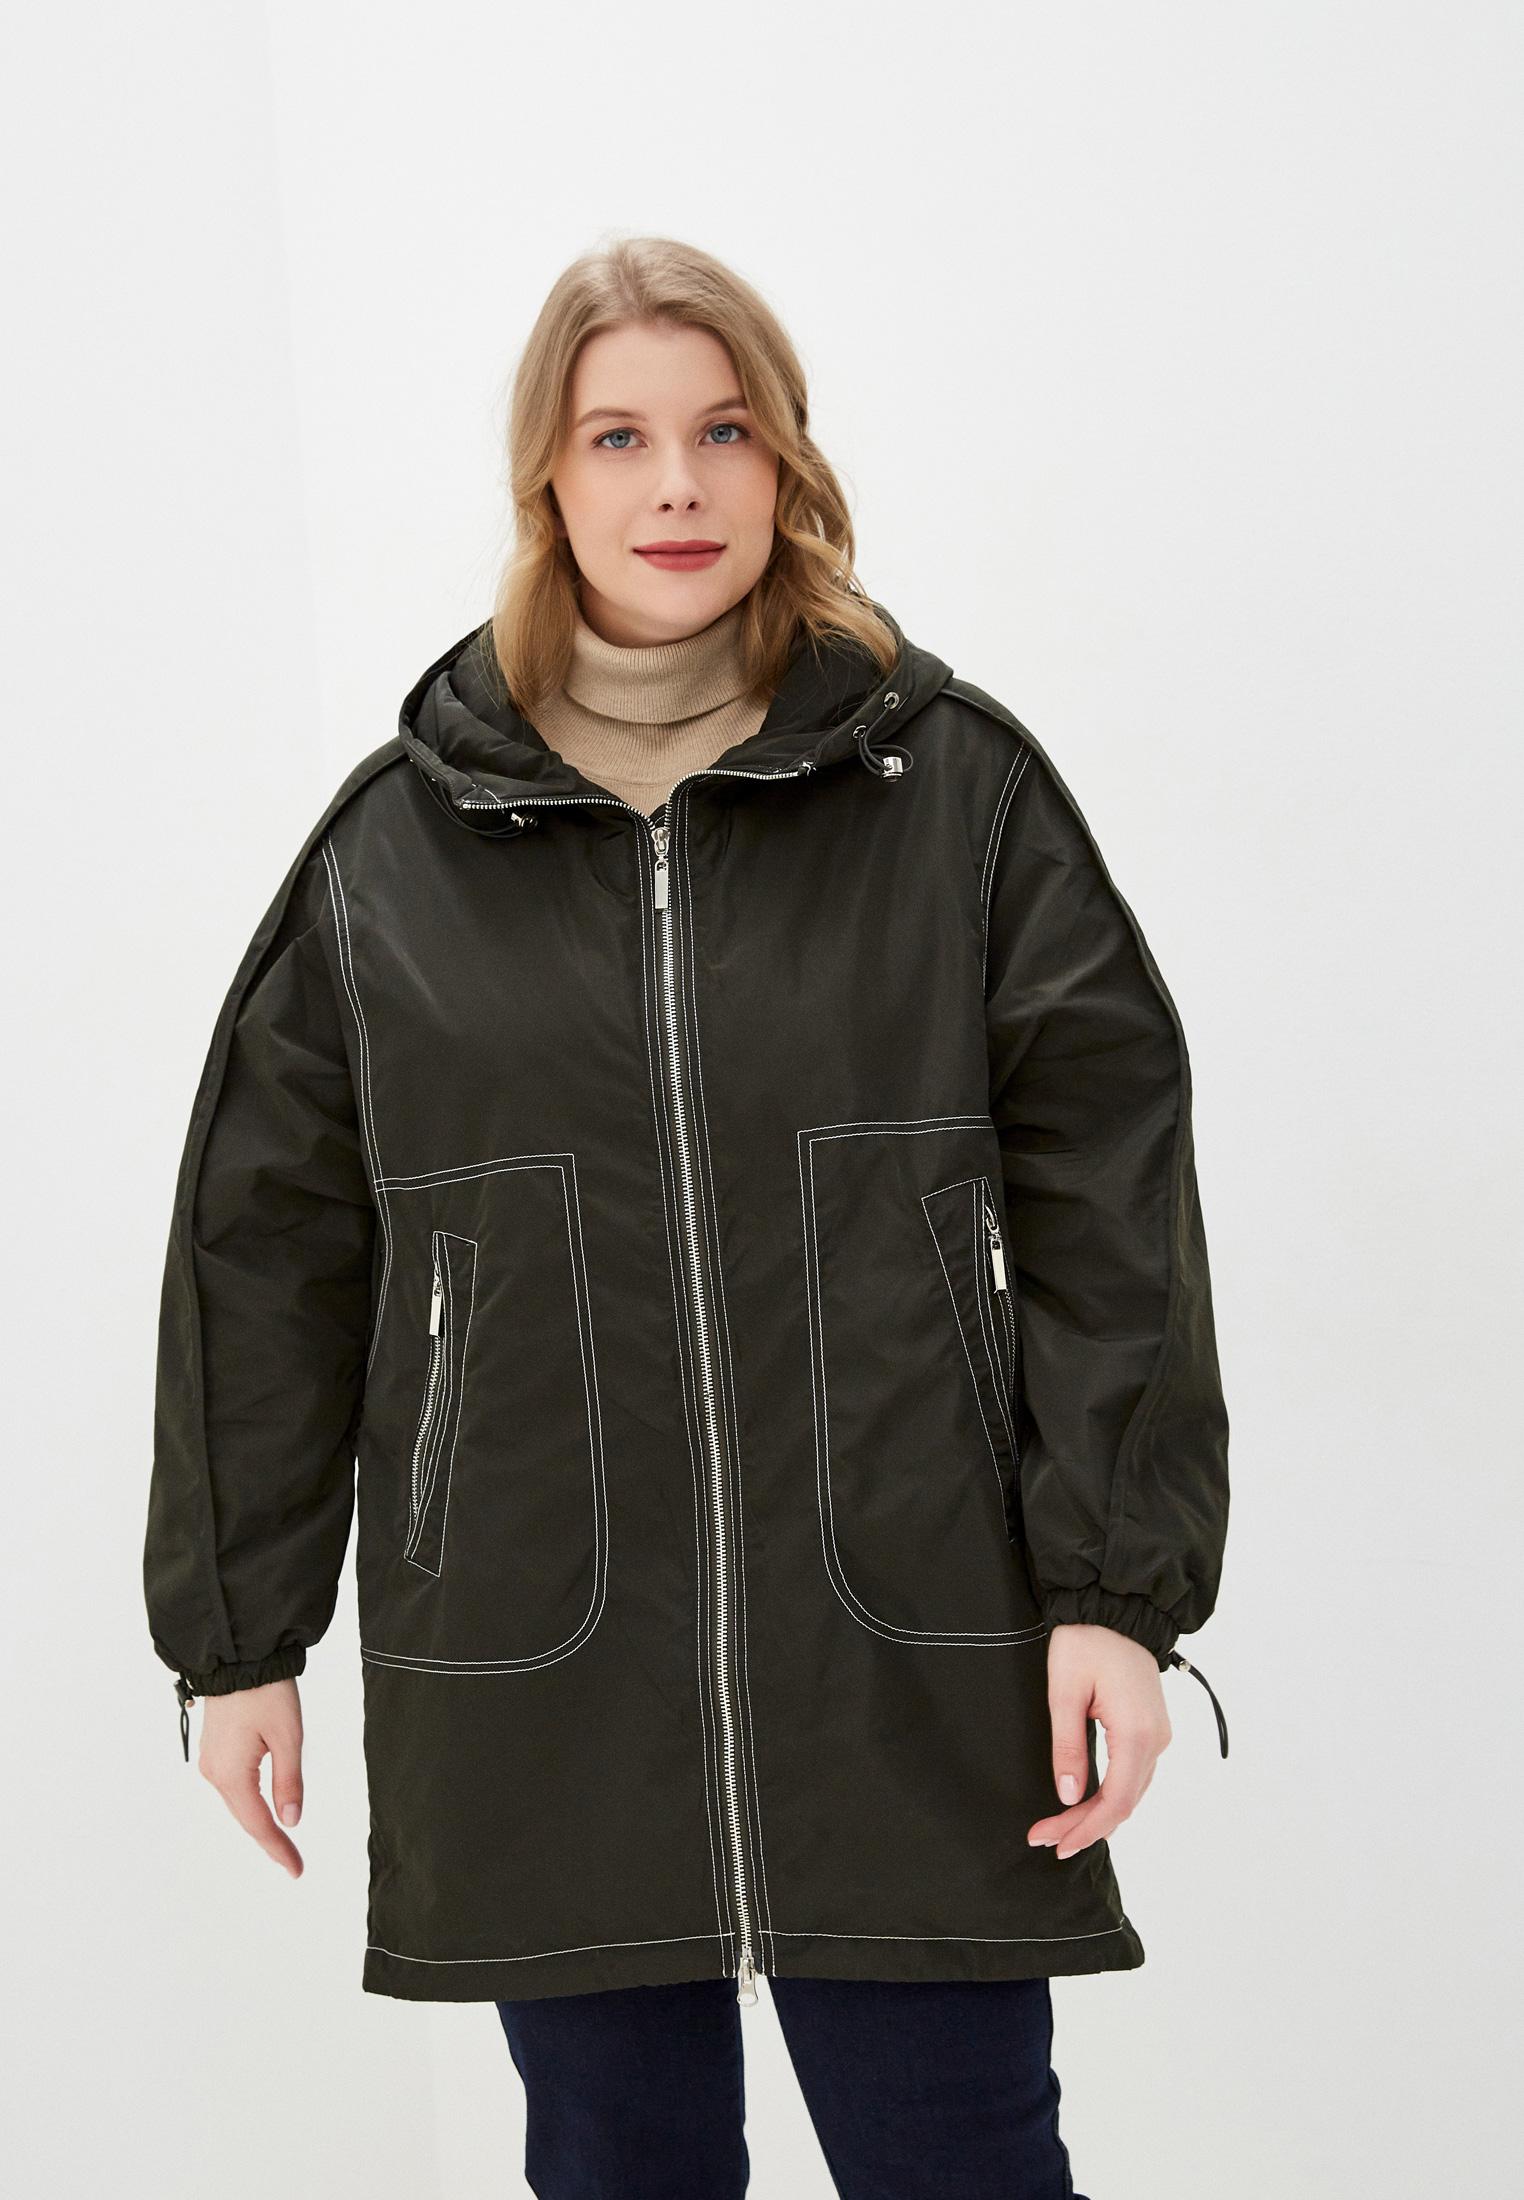 Куртка утепленная Chic & Charisma за 7 243 ₽. в интернет-магазине Lamoda.ru